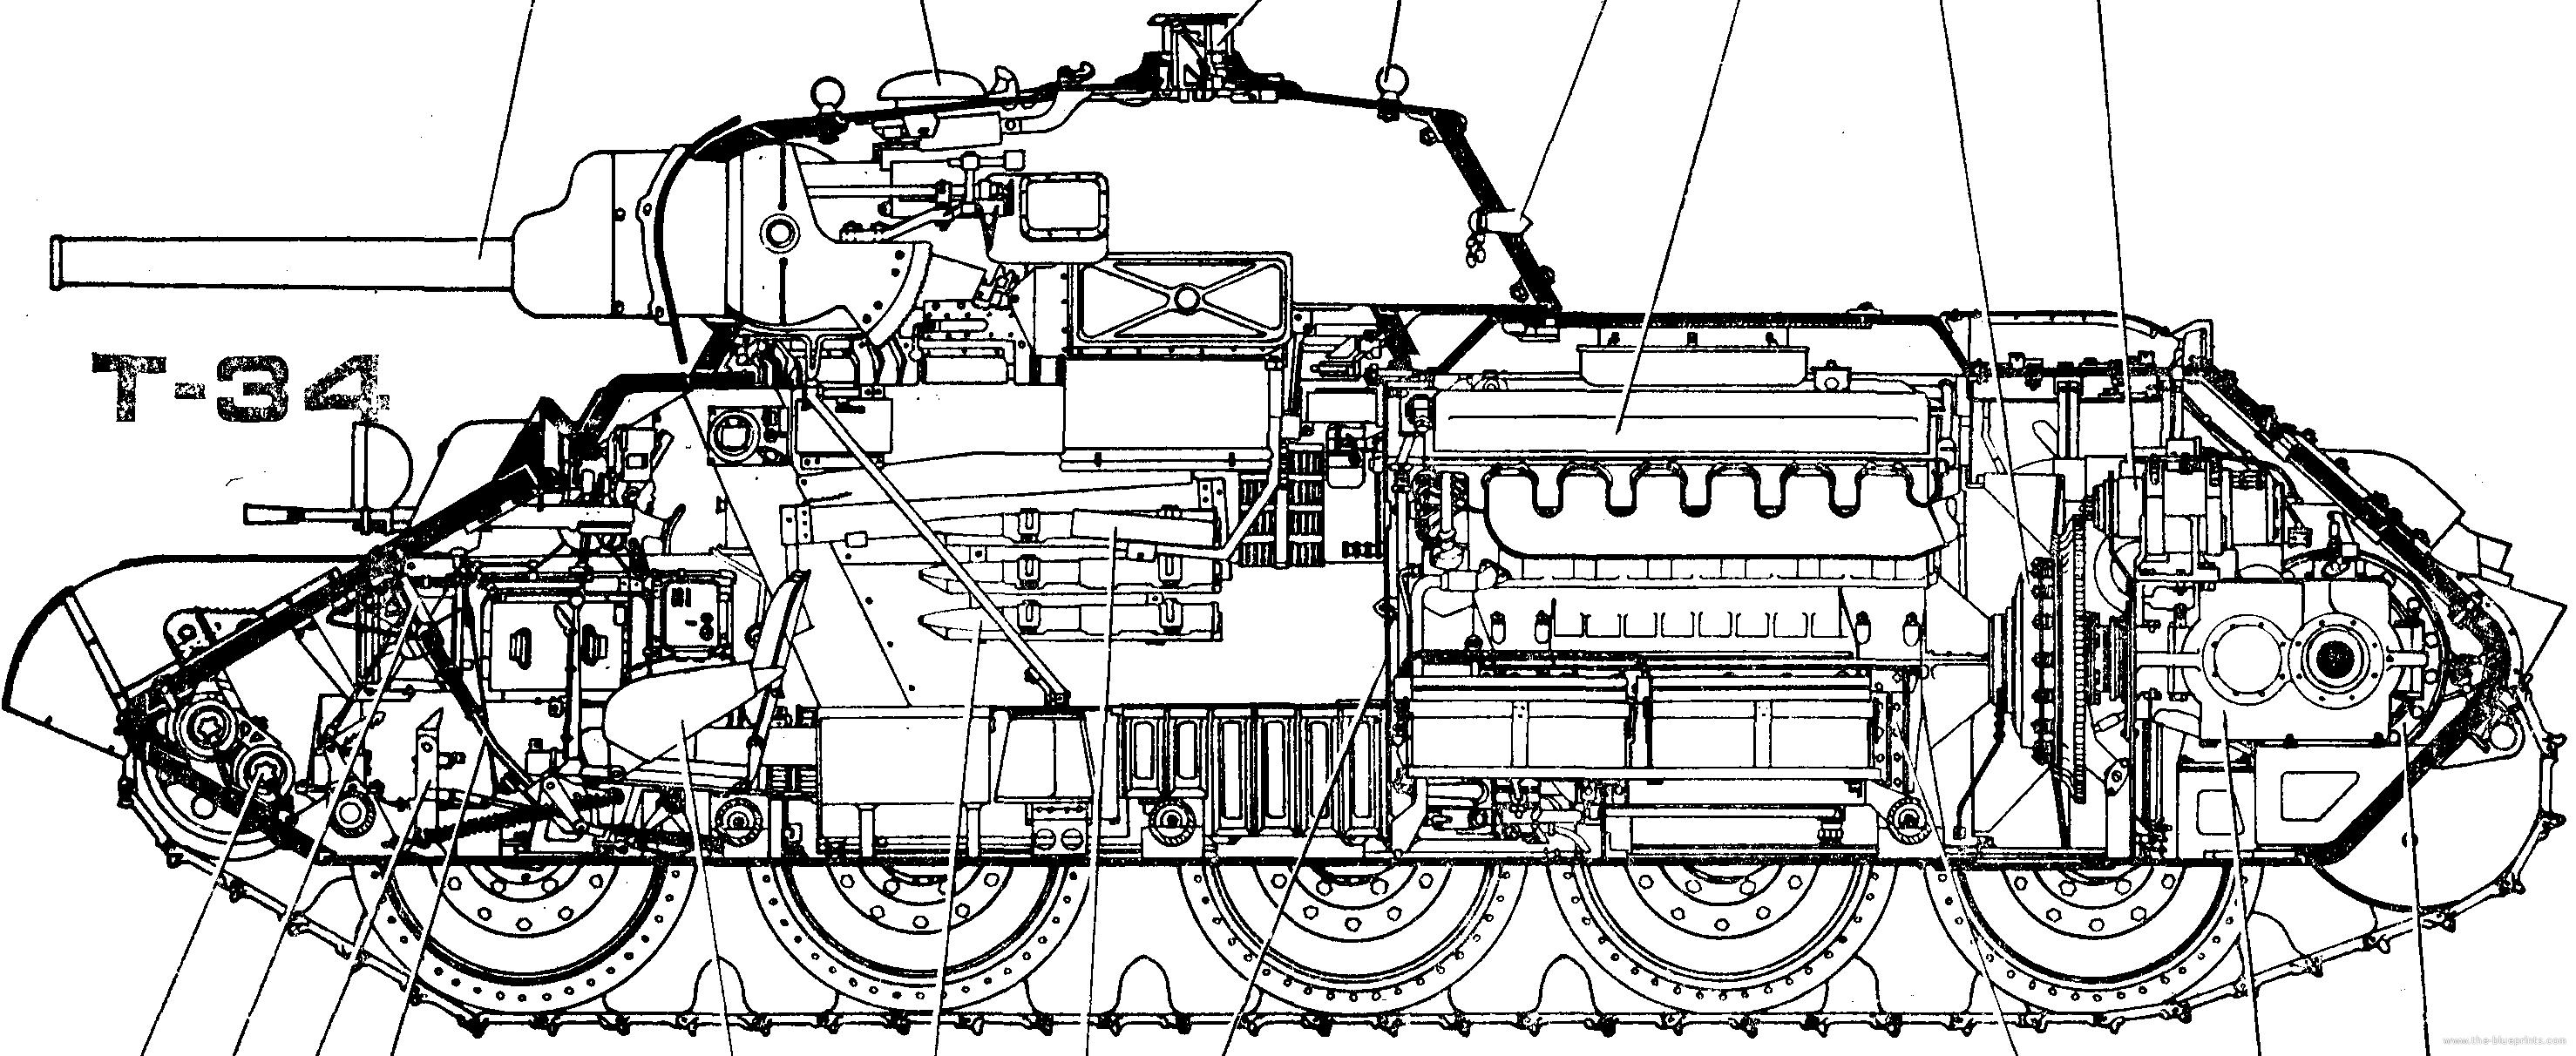 T-34 blueprint